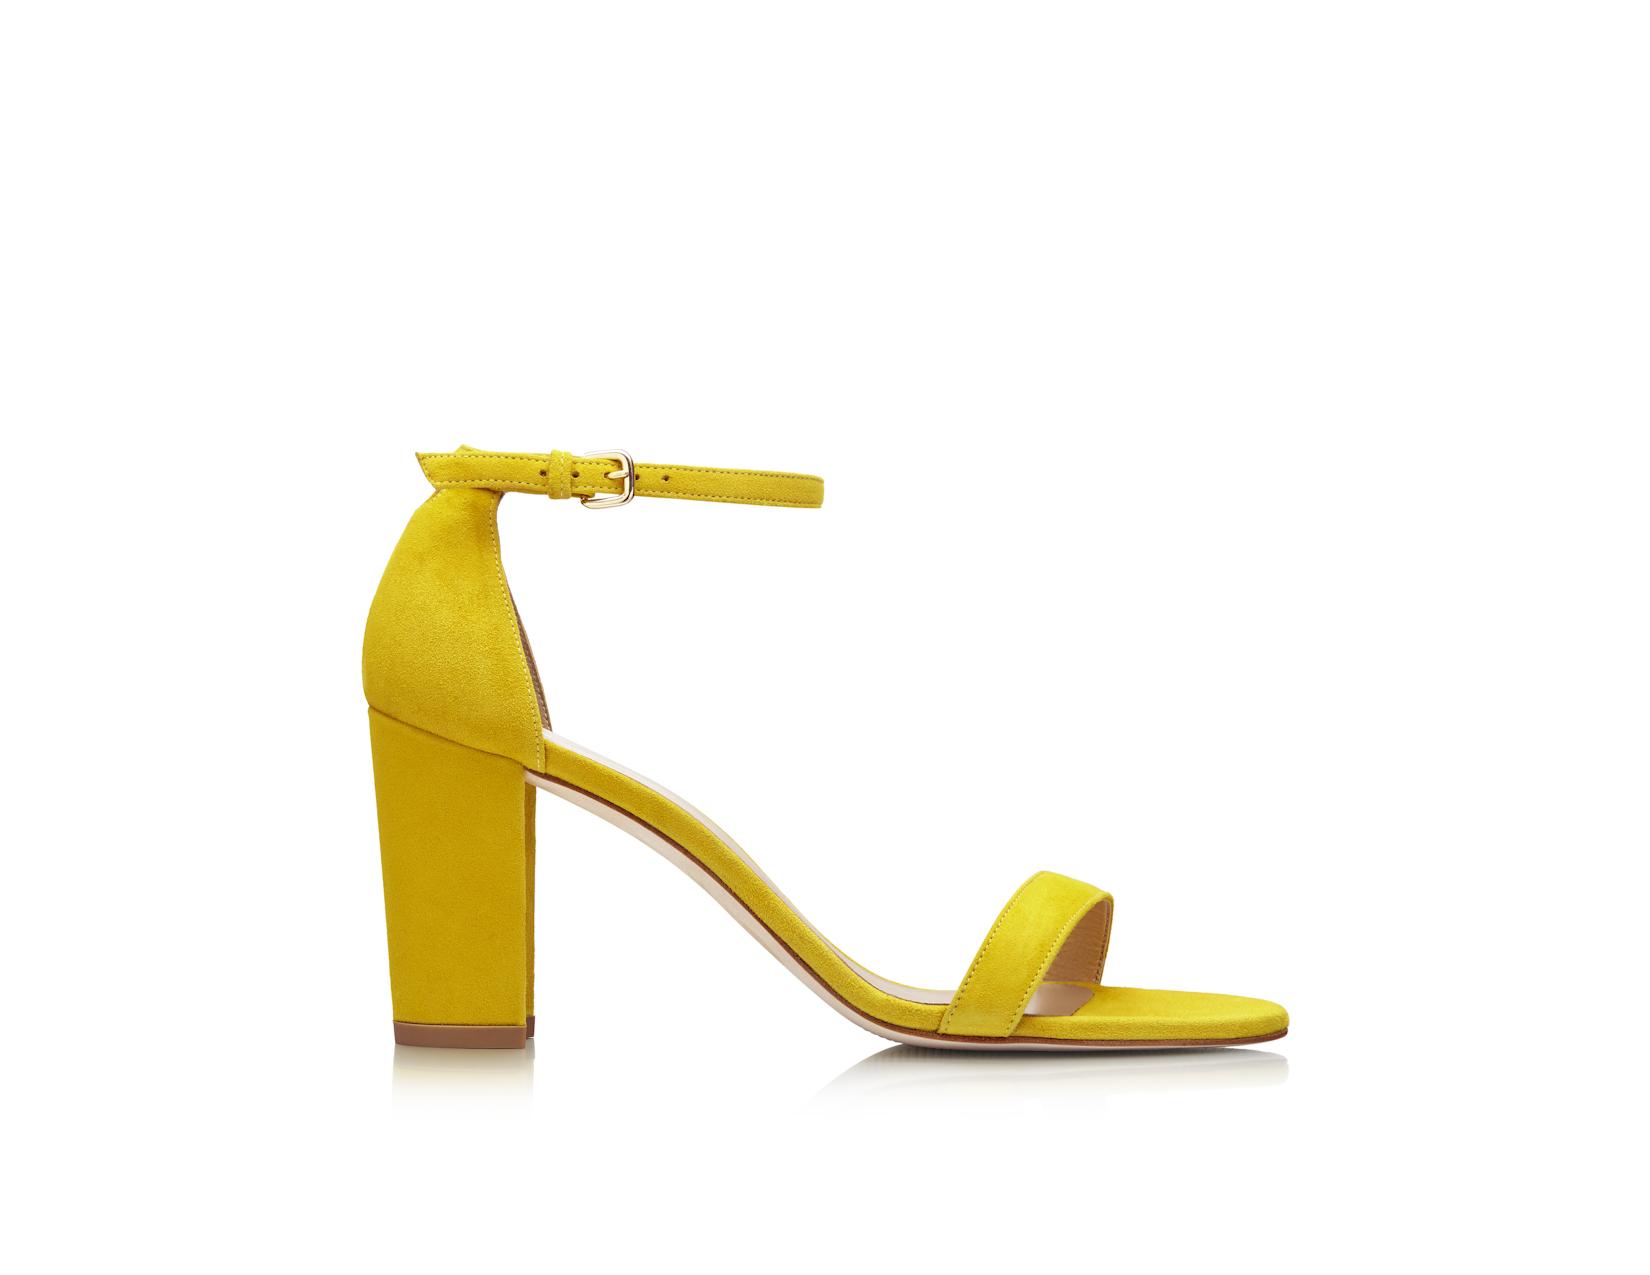 Stuart Weitzman yellow NearlyNude sandal for Pencils of Promise